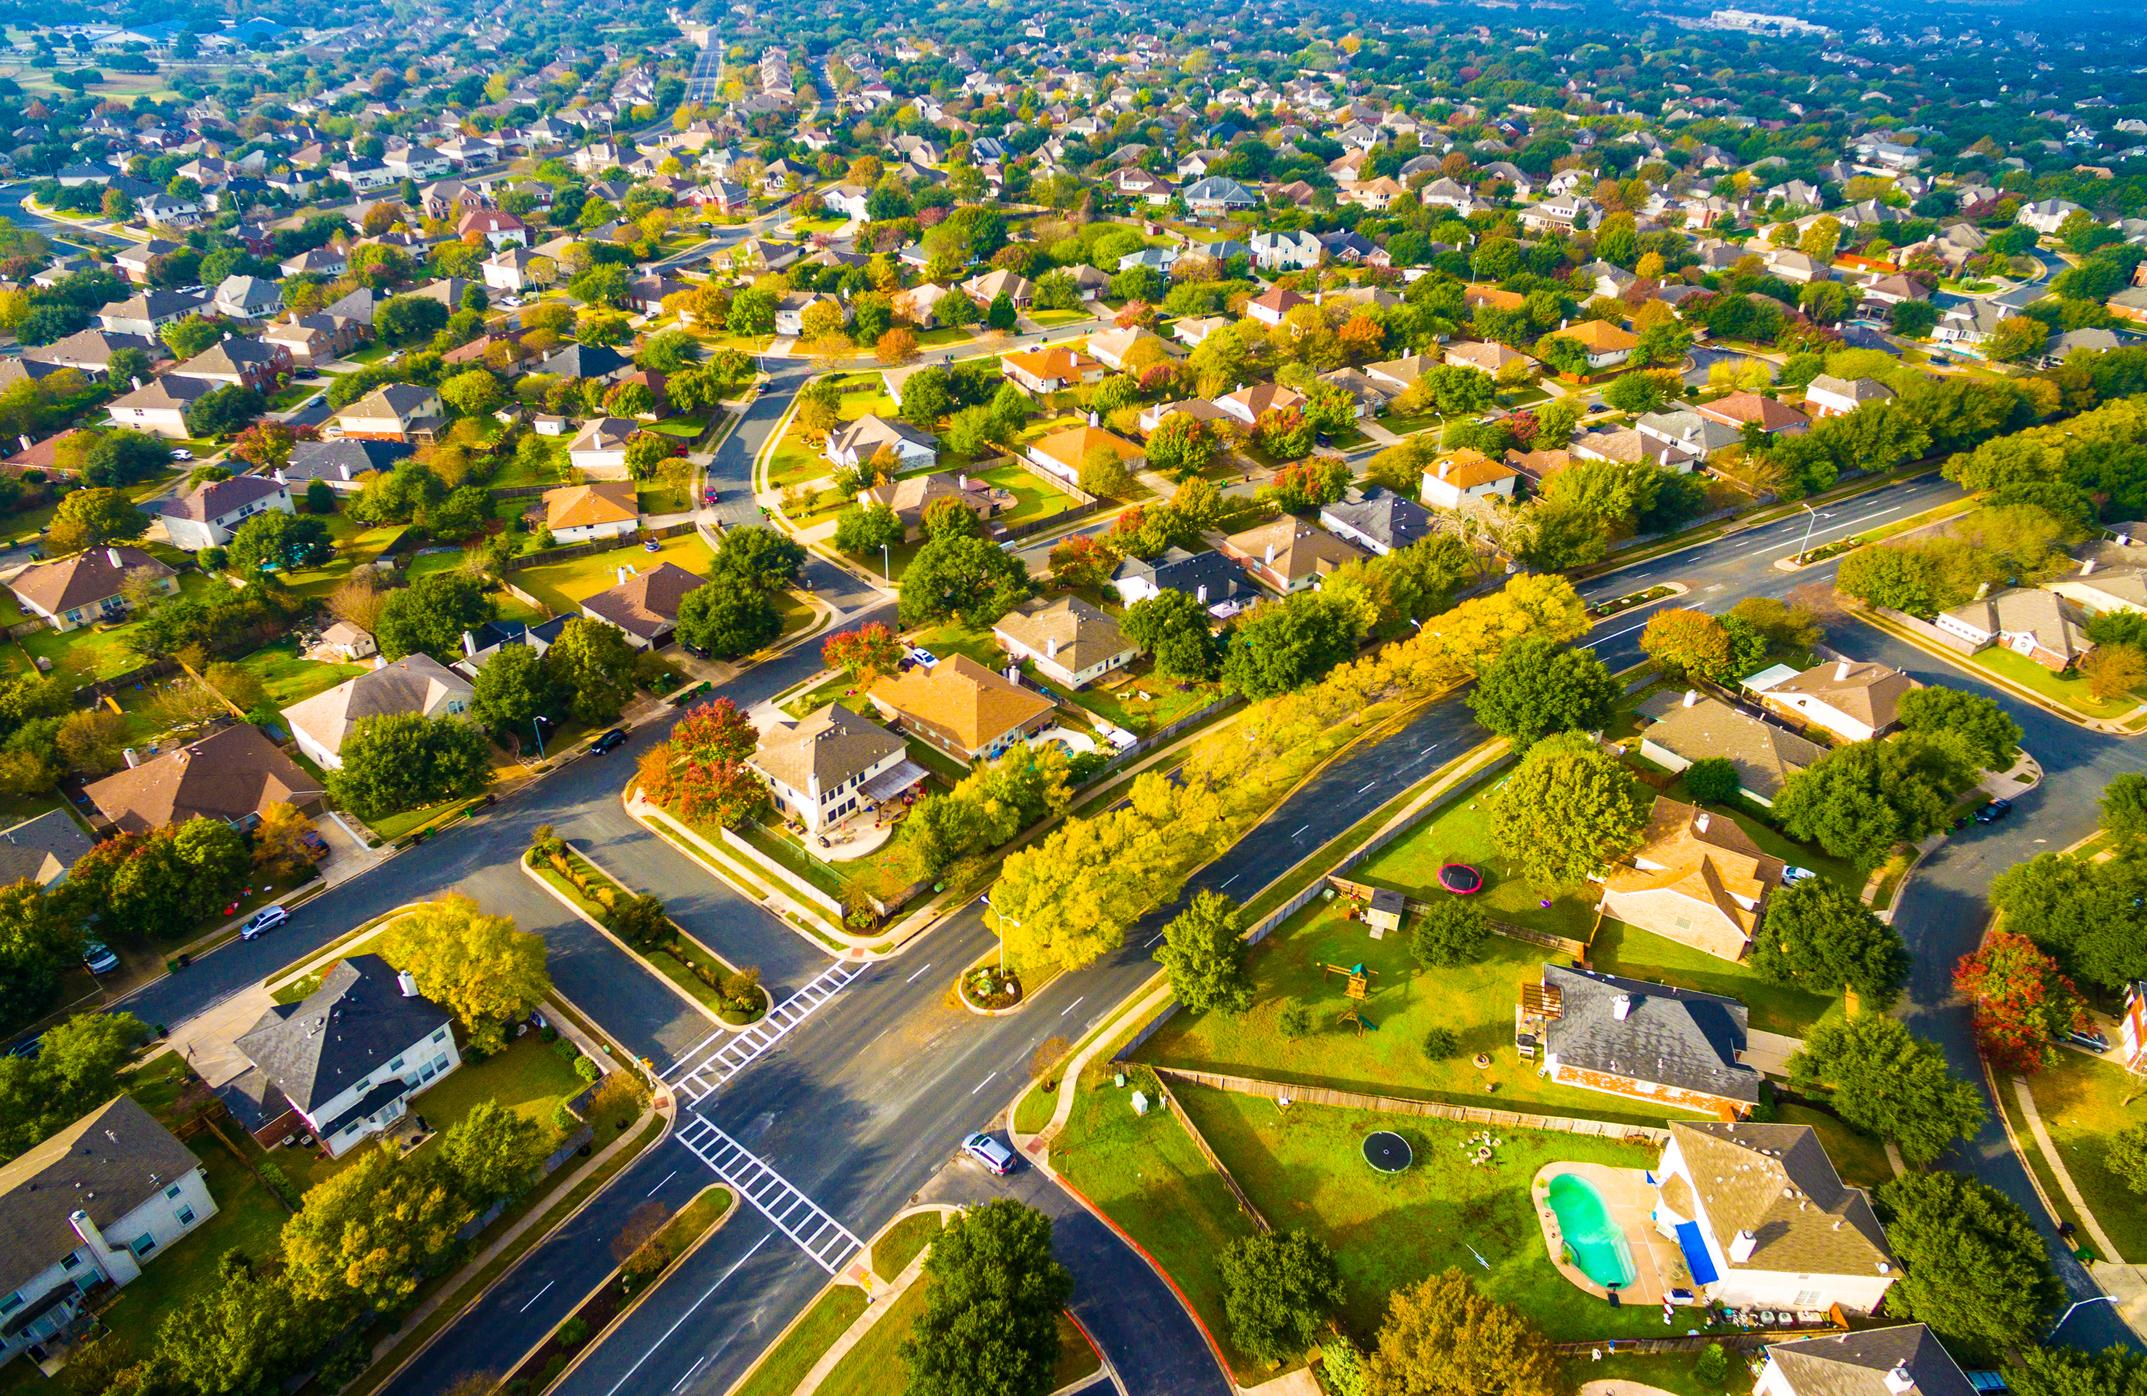 Overhead photo of housing development